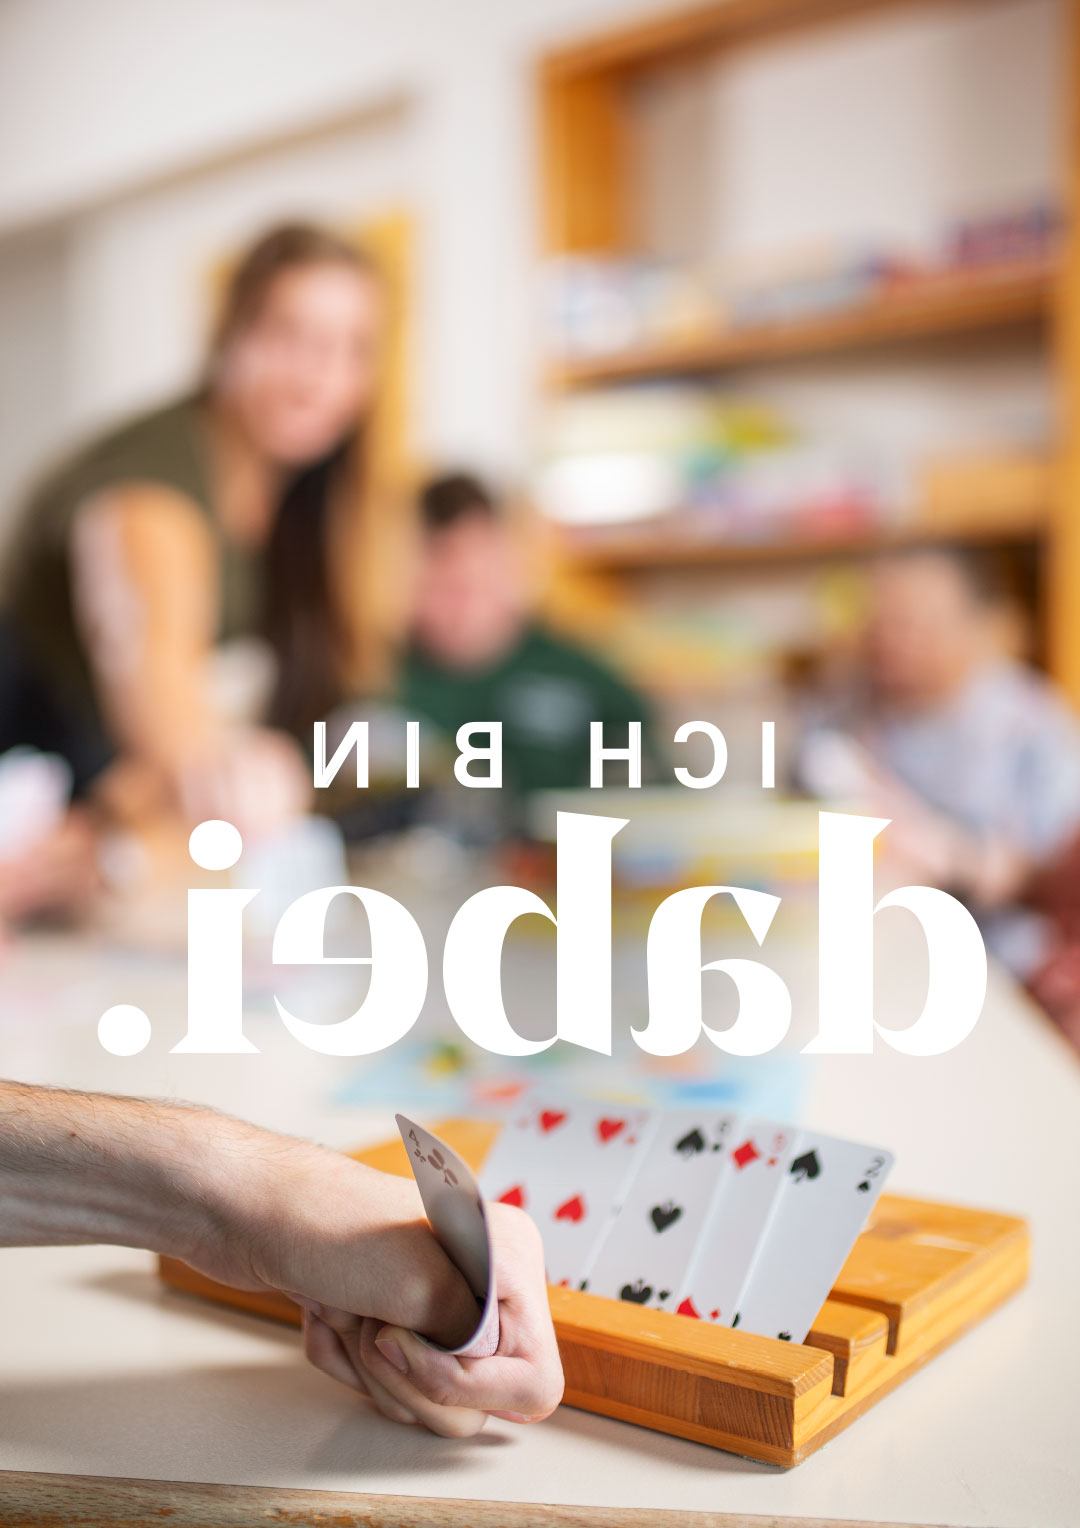 djw-lebenshilfe-hoch-sujet-kartenspielen-teaser